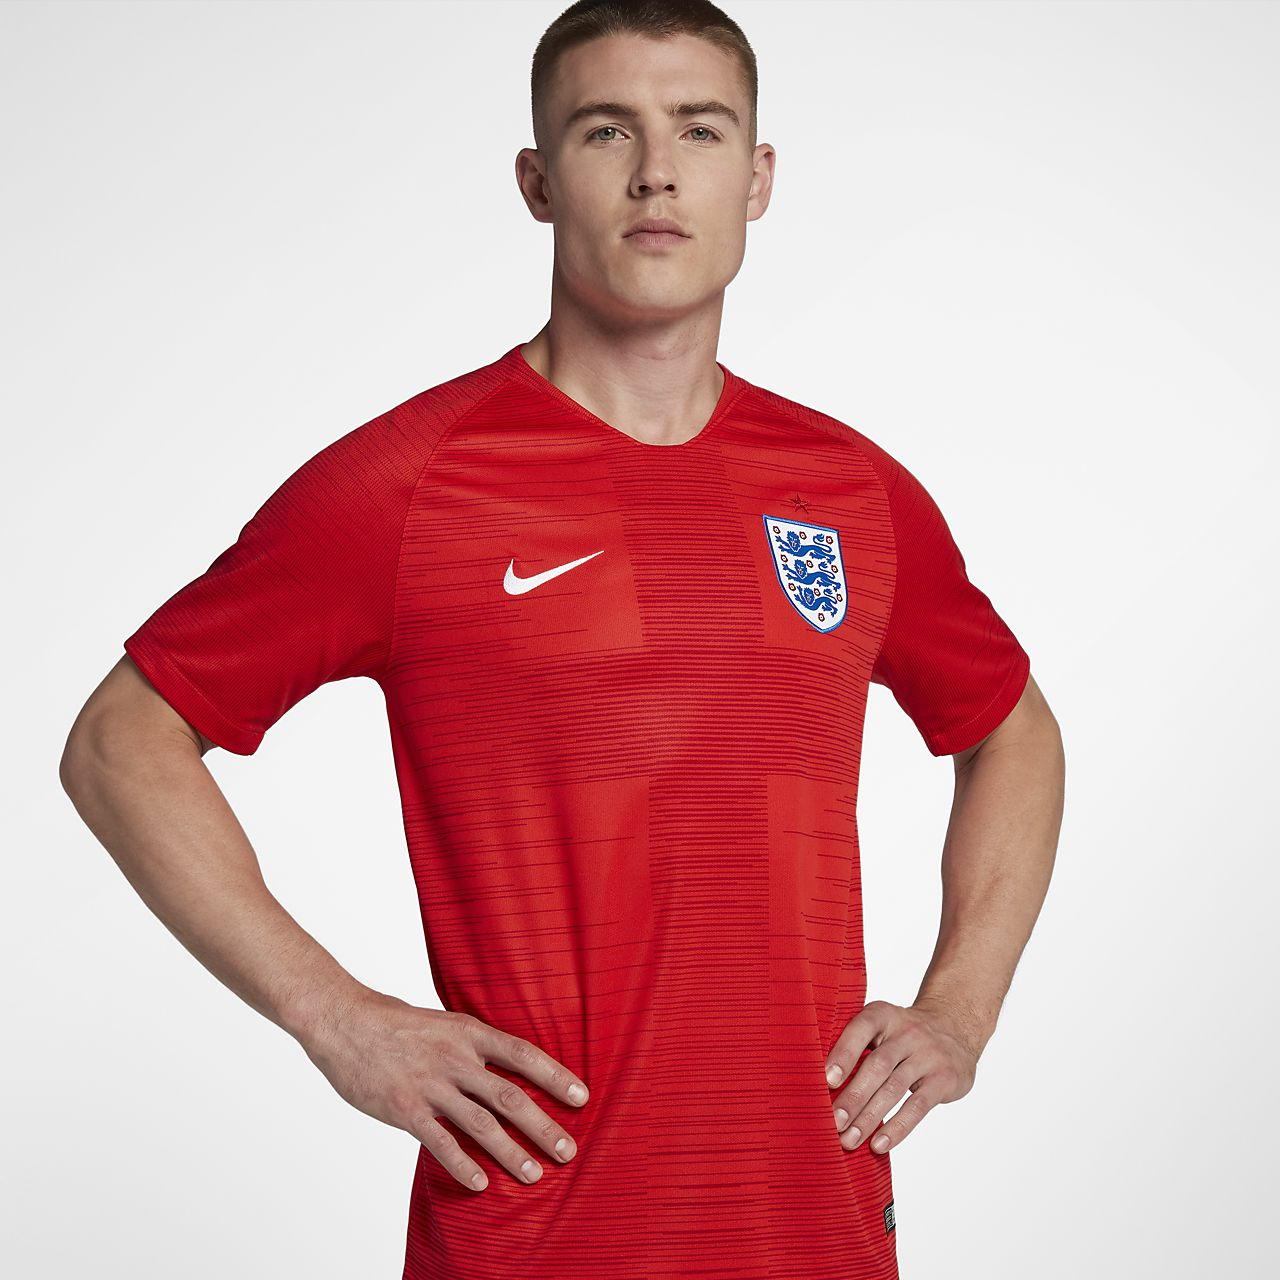 Camiseta de fútbol para hombre 2018 England Stadium Away